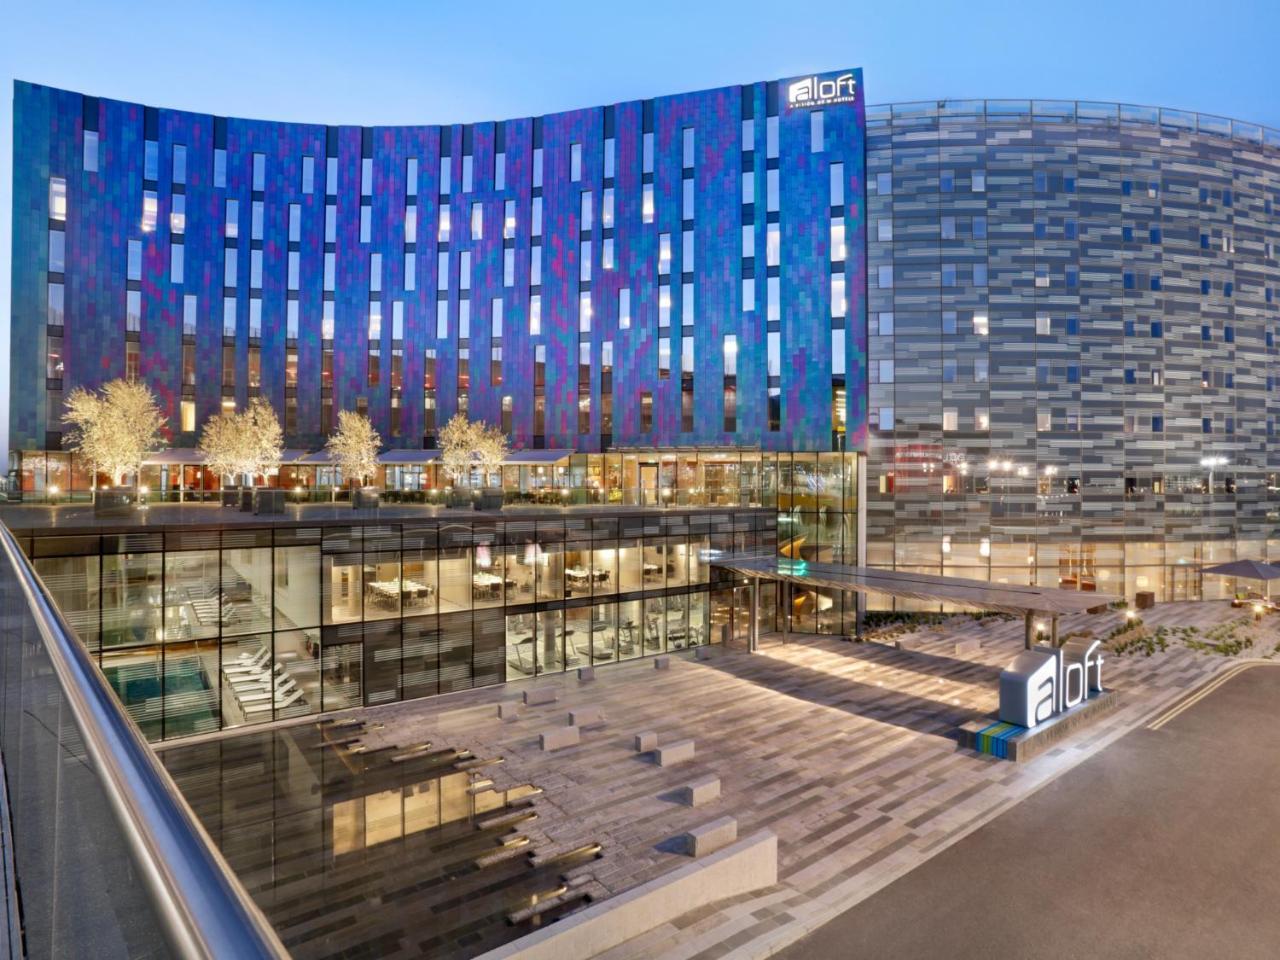 Aloft London Excel Hotel